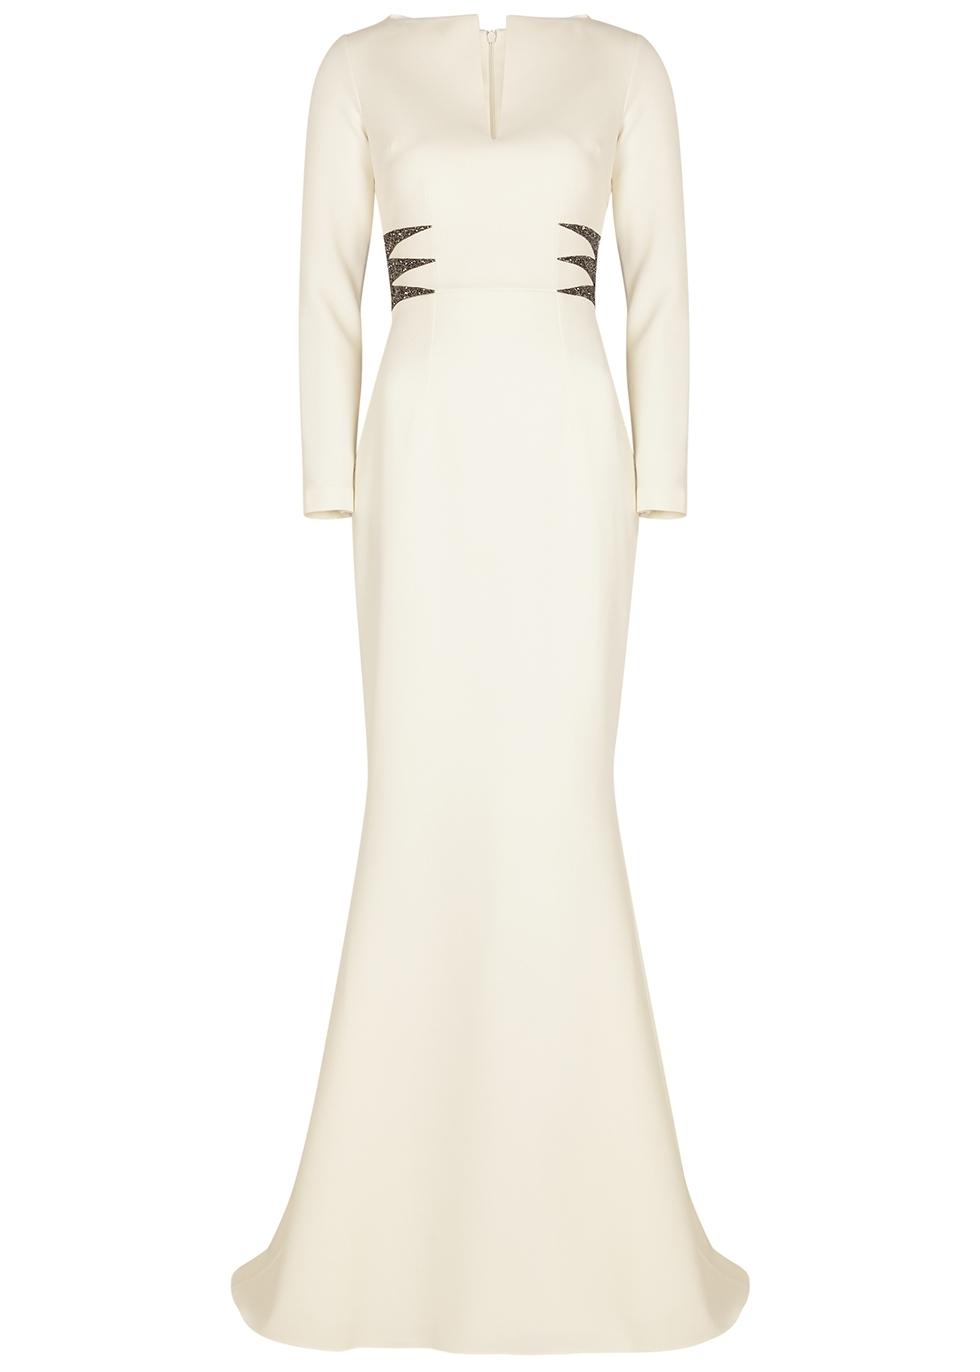 177392efa Designer Gowns - Evening & Ball Gowns - Harvey Nichols